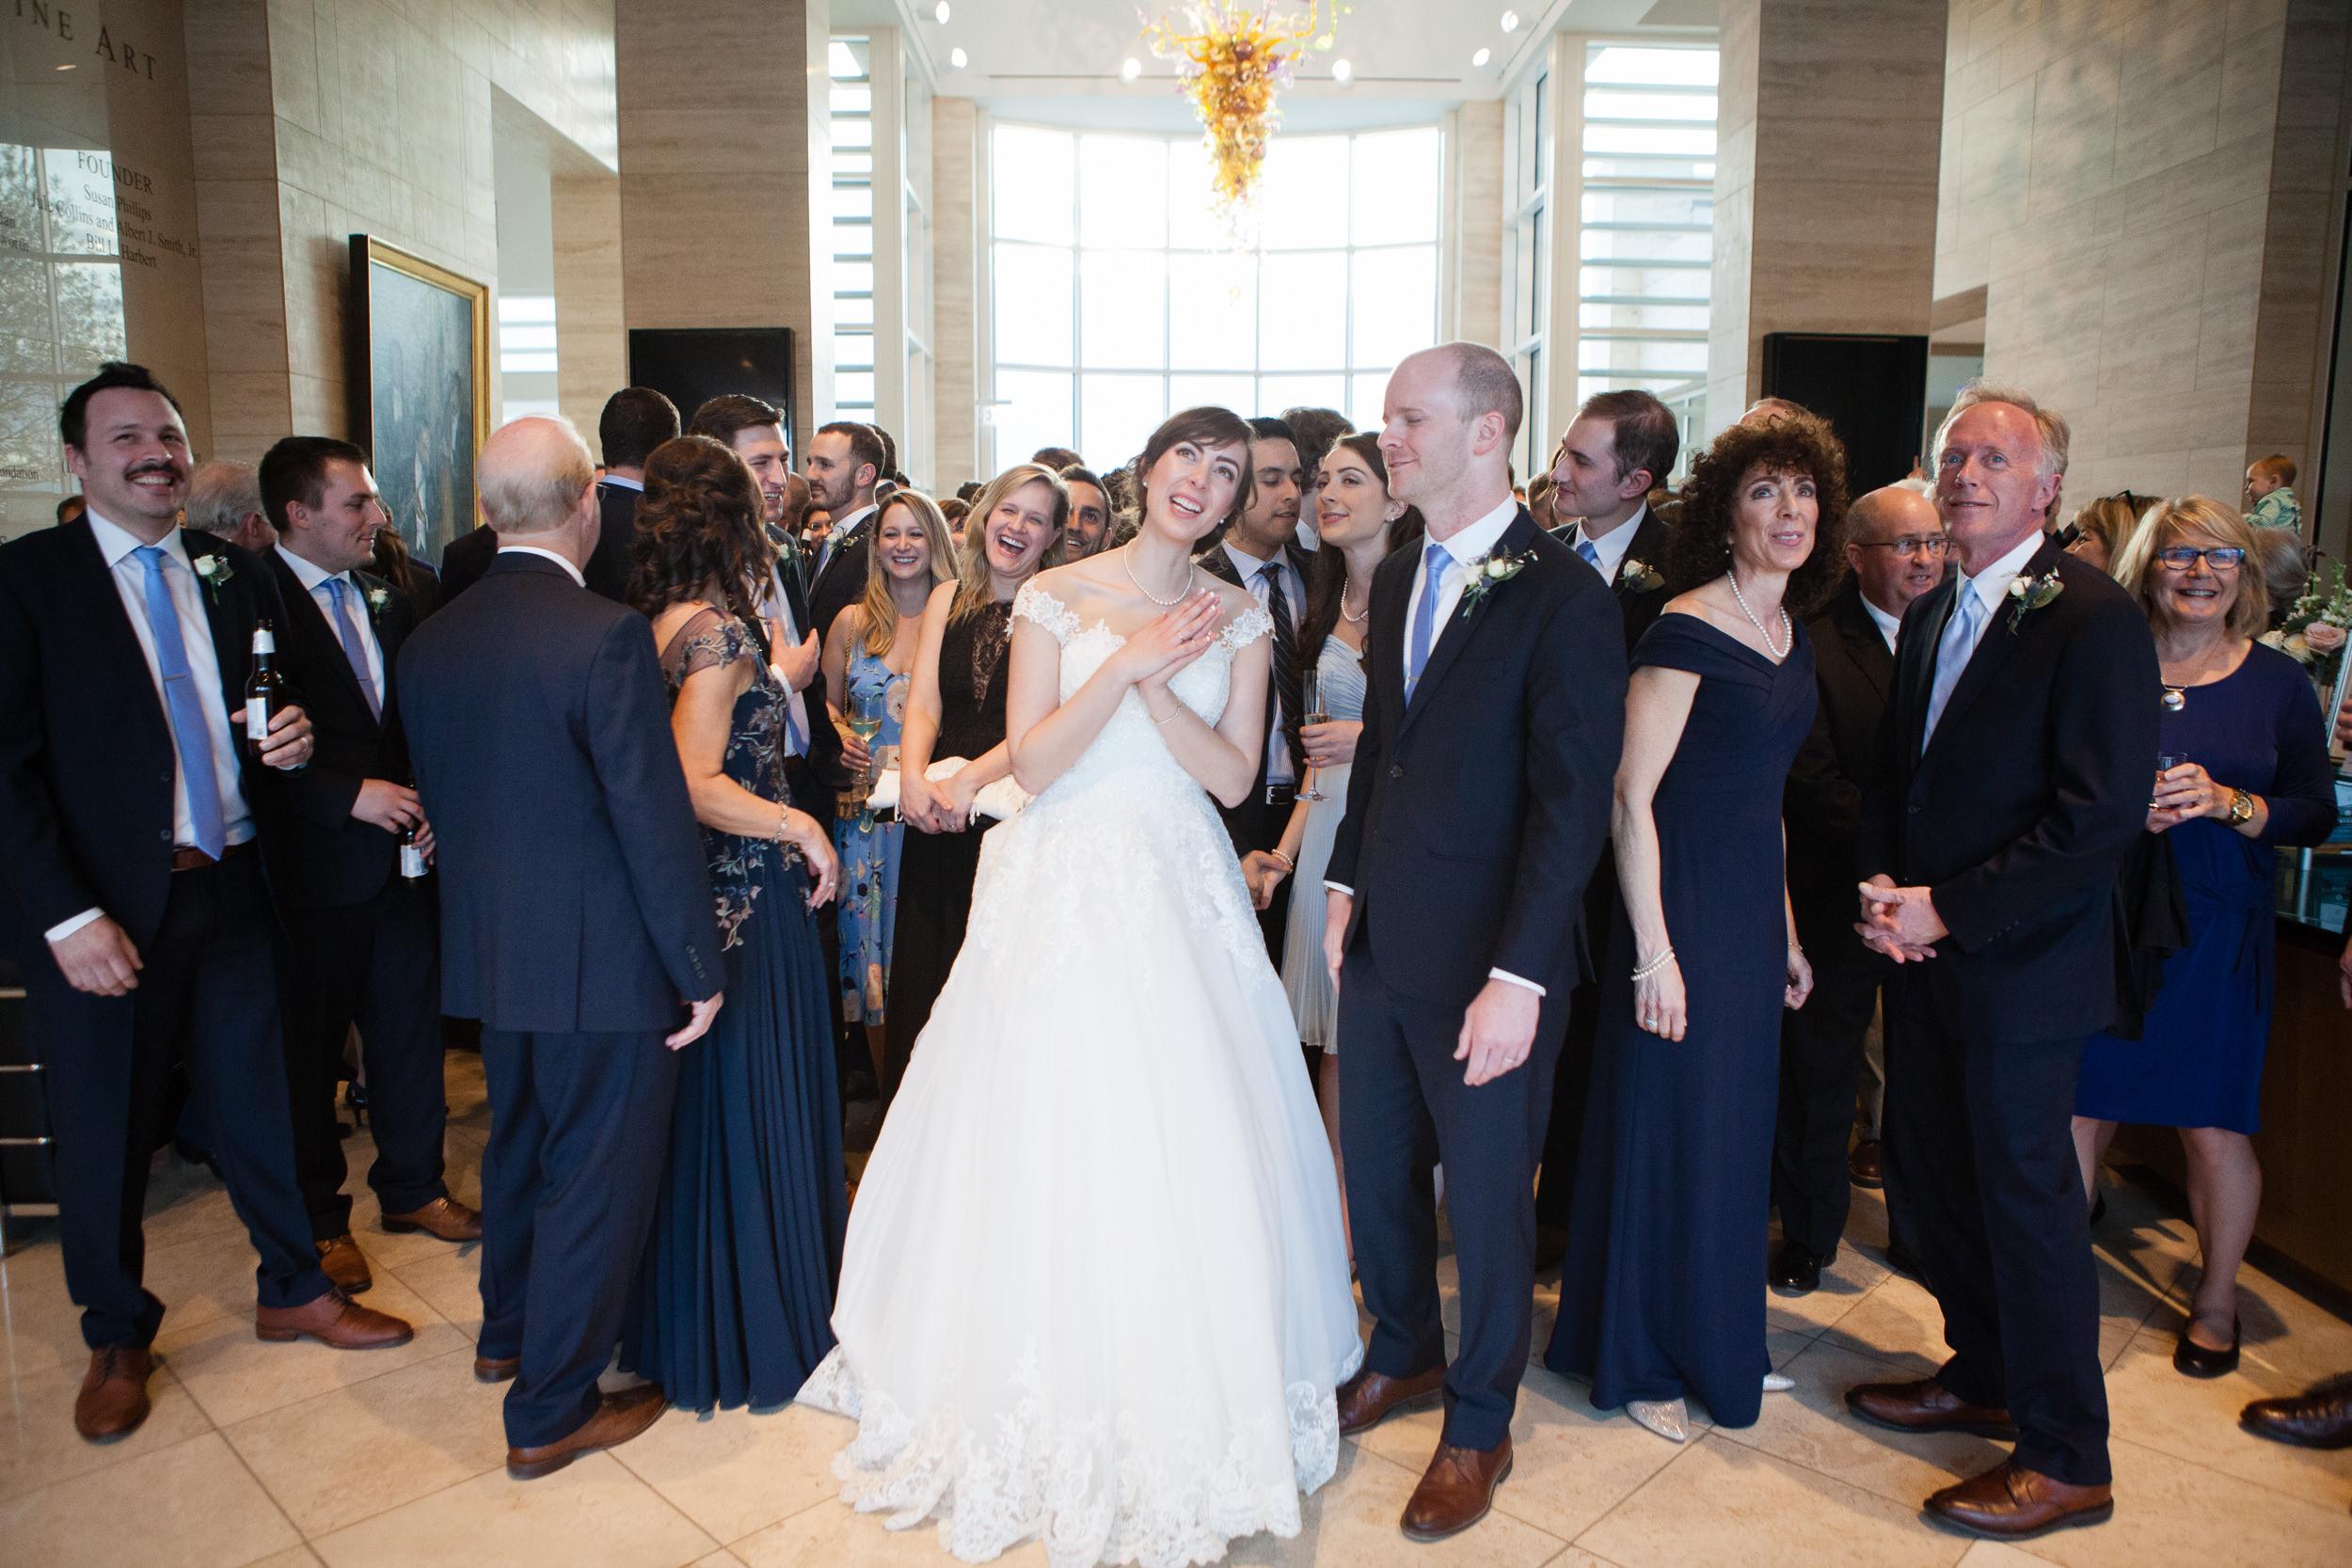 AB_Auburn_Wedding_2019-00069.jpg